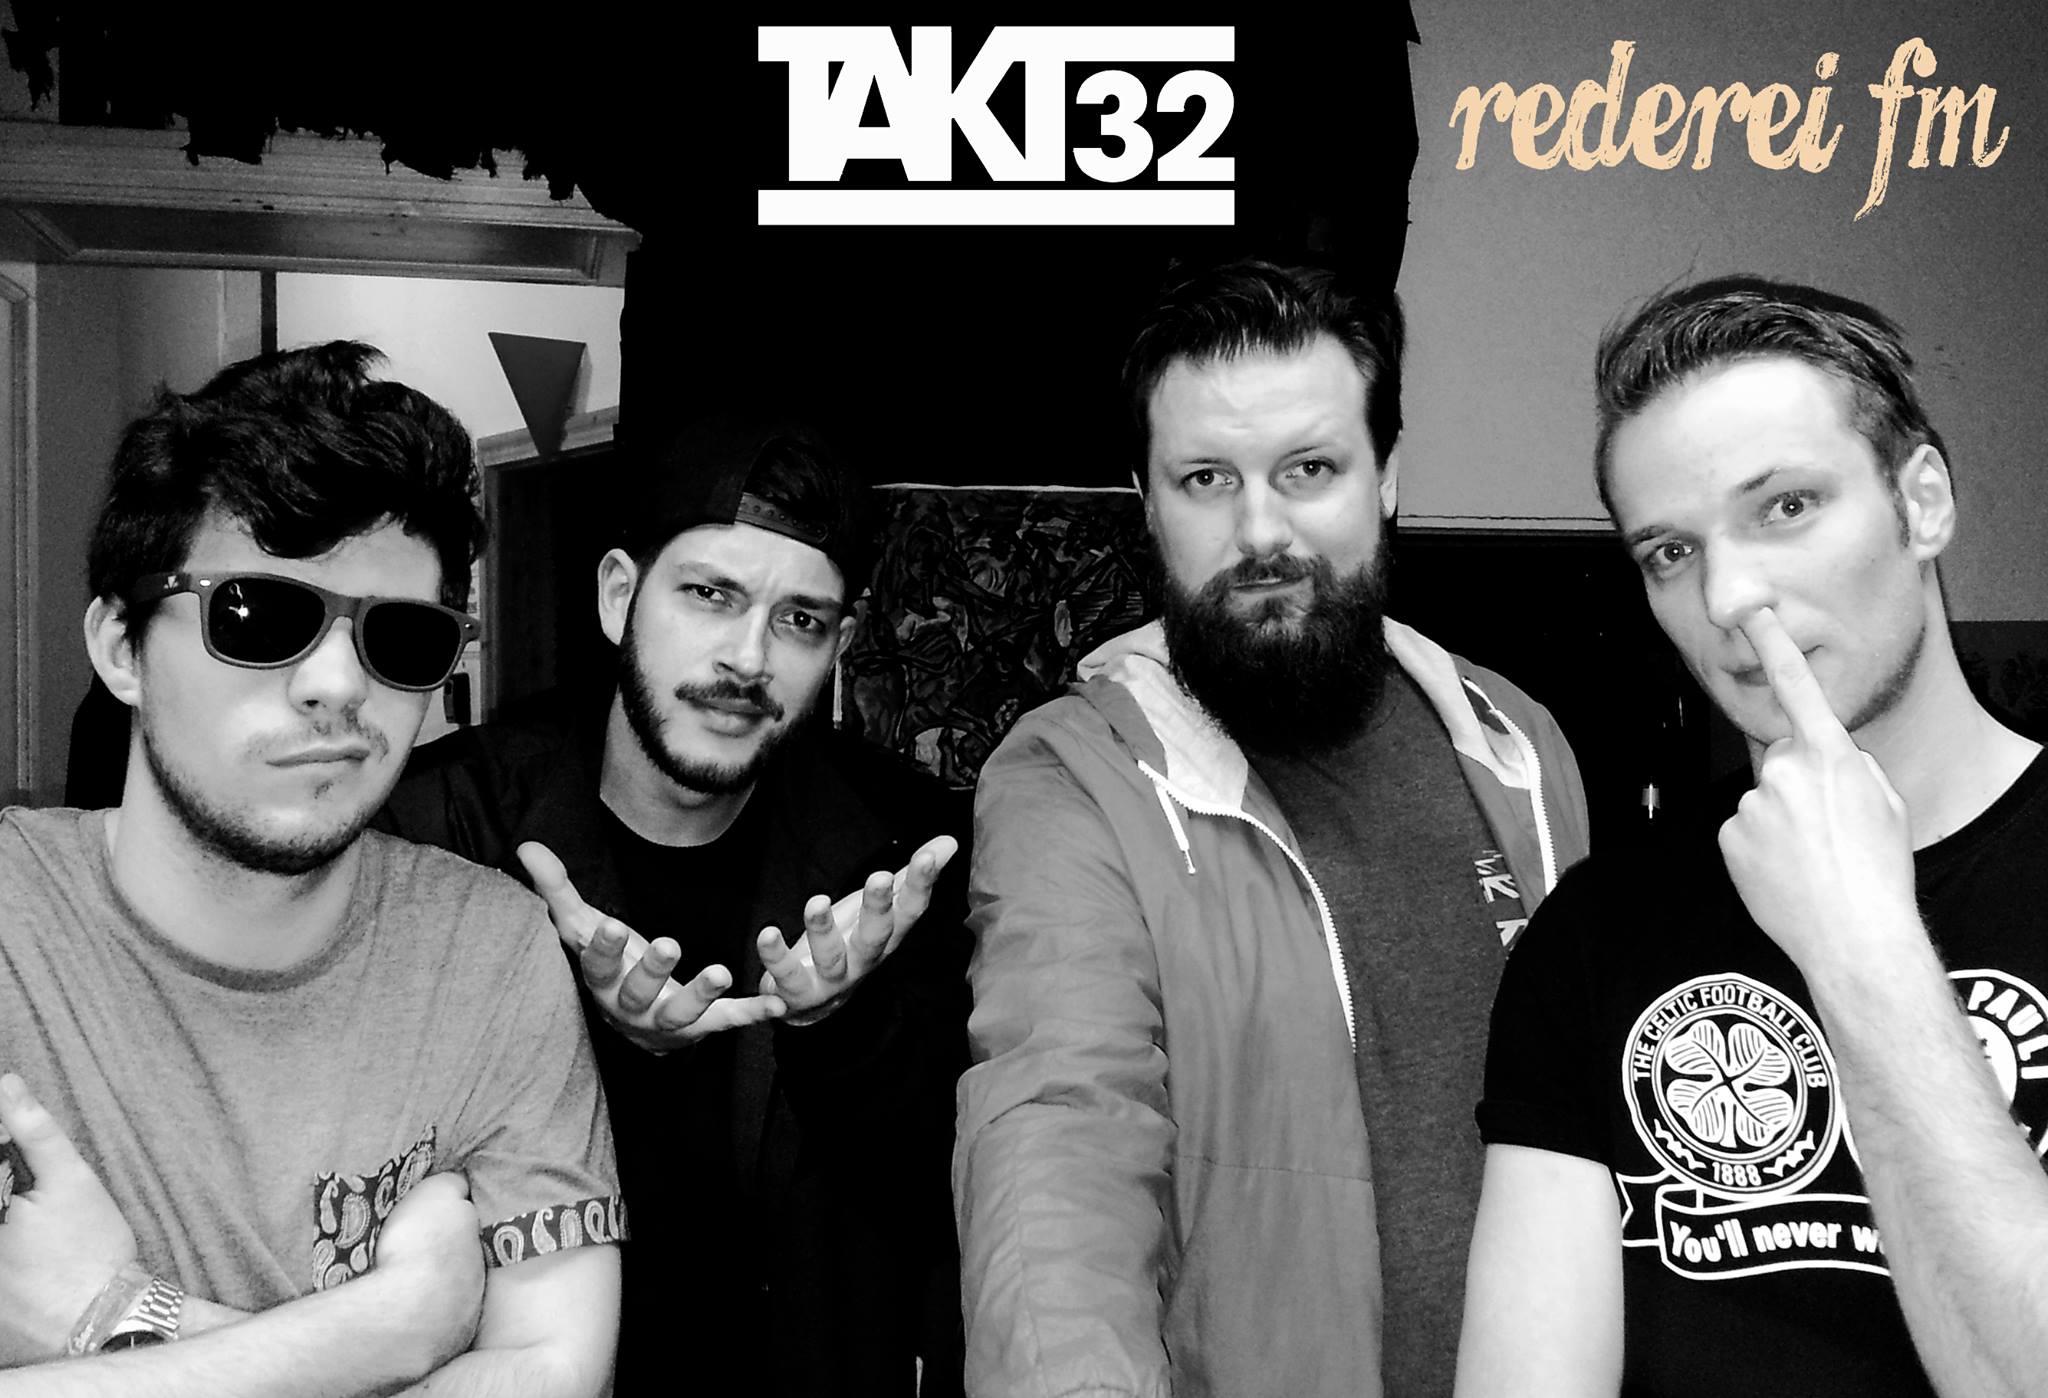 Takt 32 - Rederei FM